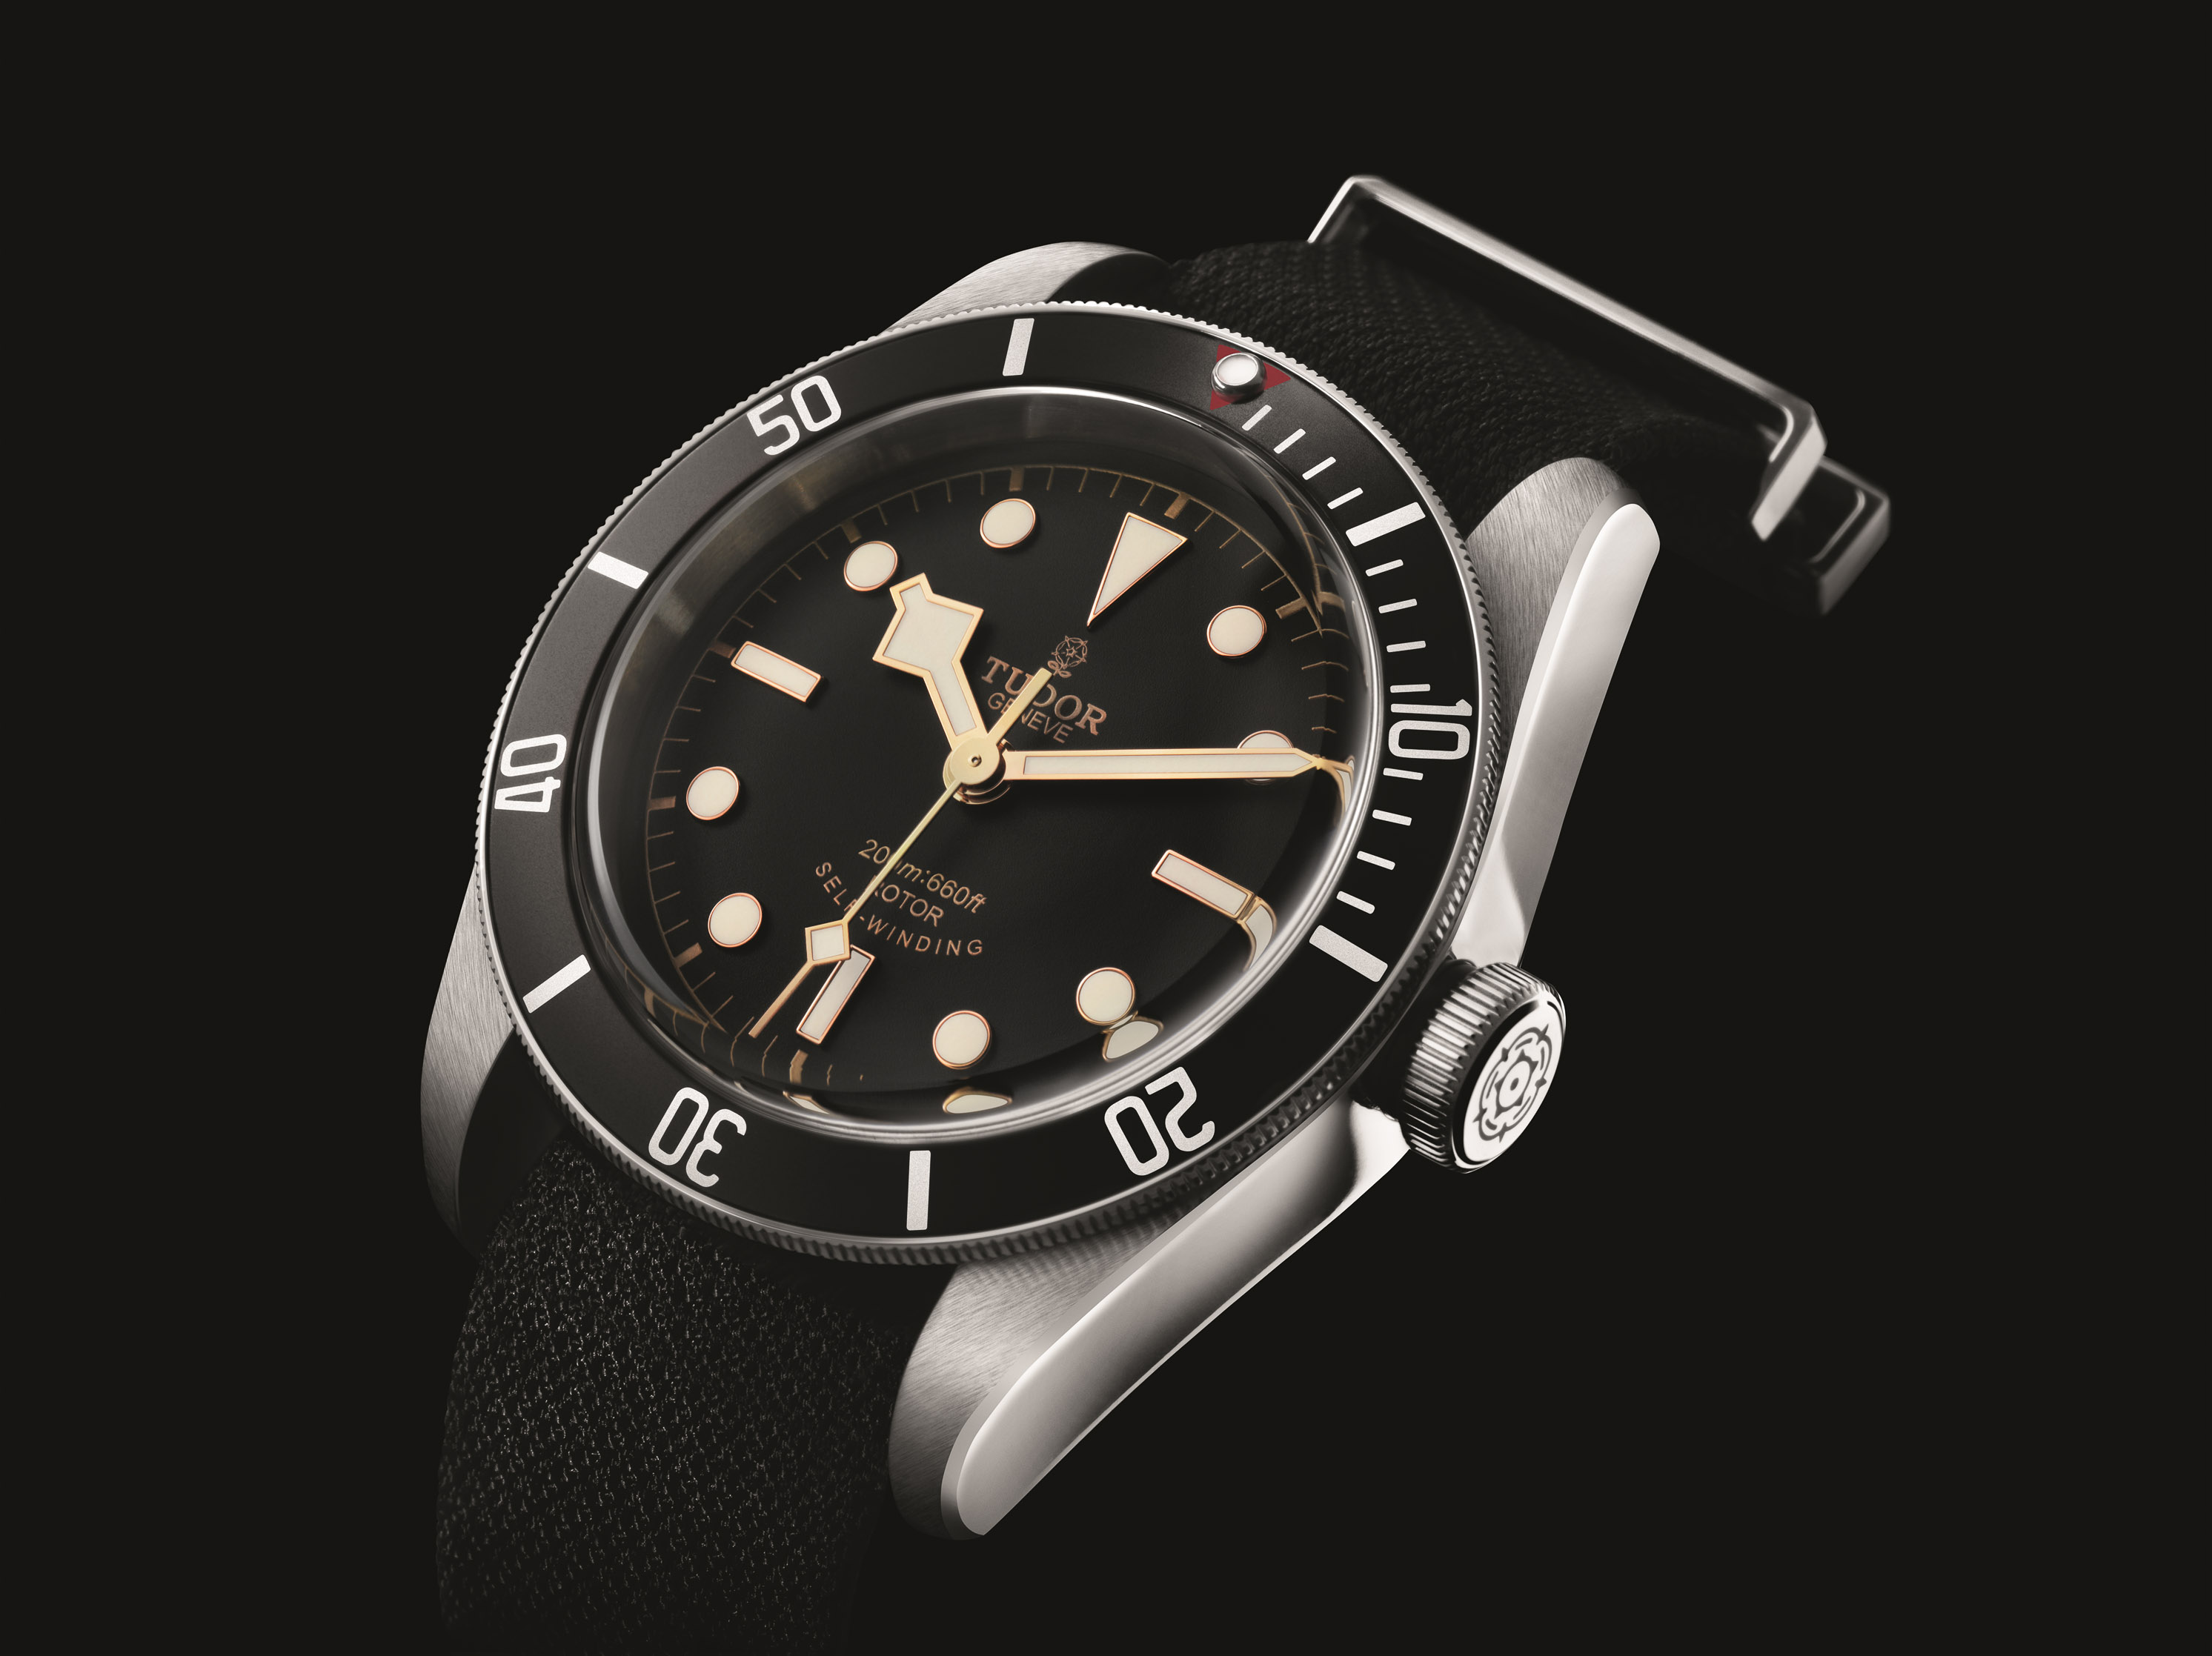 Uhren bis 5000 Euro - Tudor Black Bay Ref. 79220N